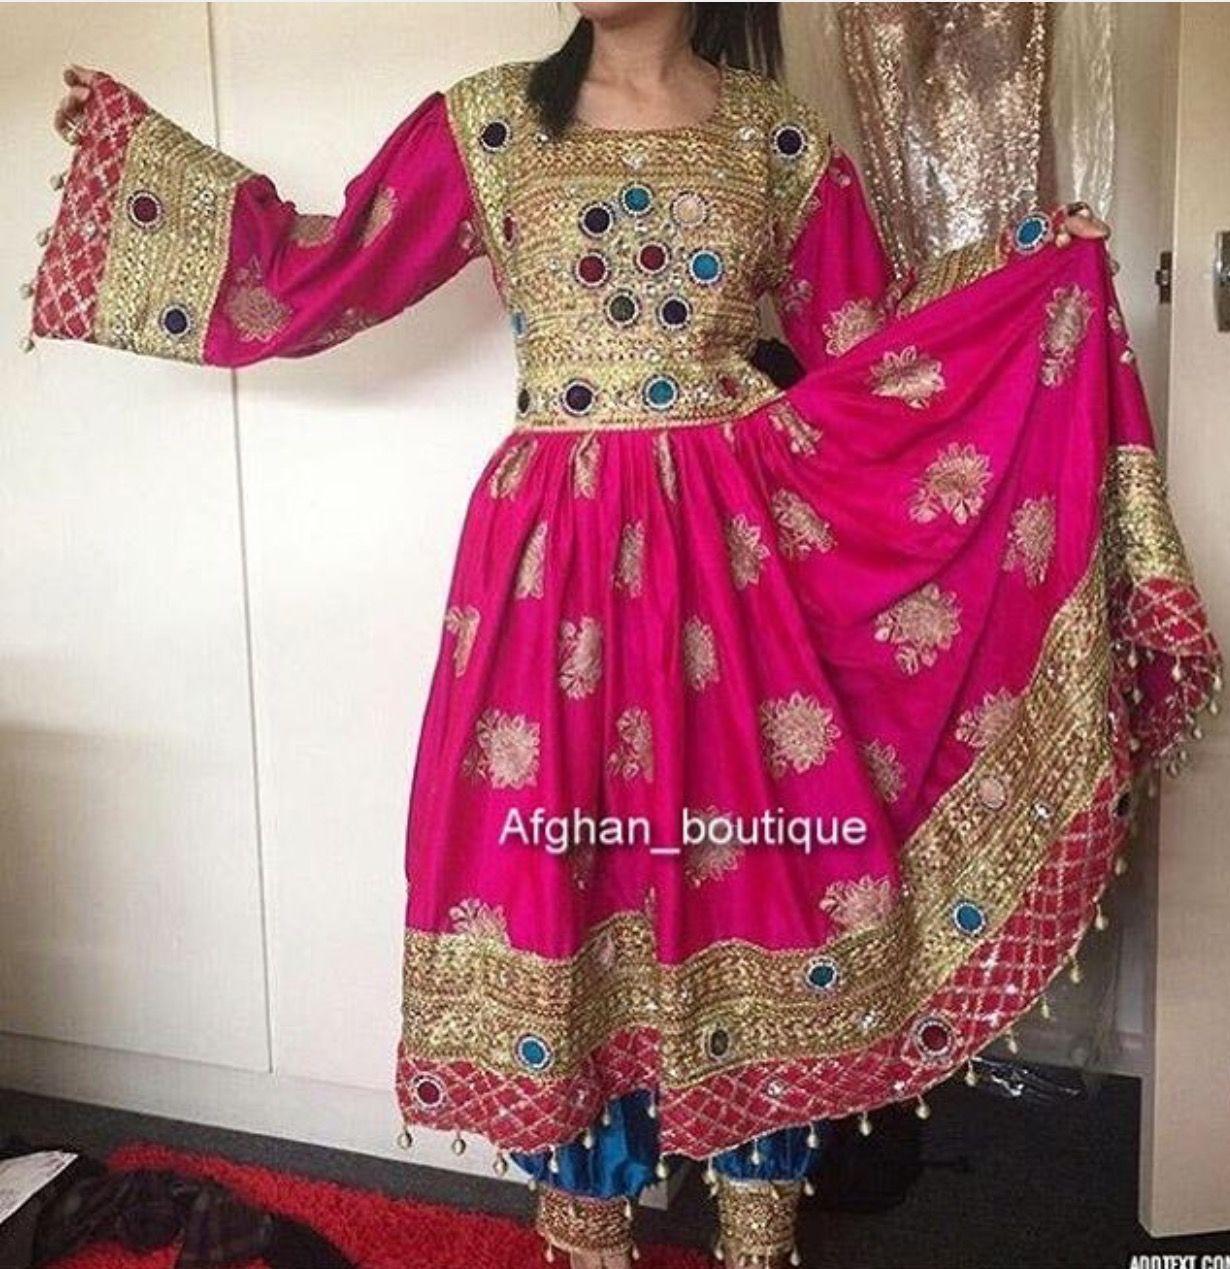 Pin de Fashion World en Afghan National dress | Pinterest